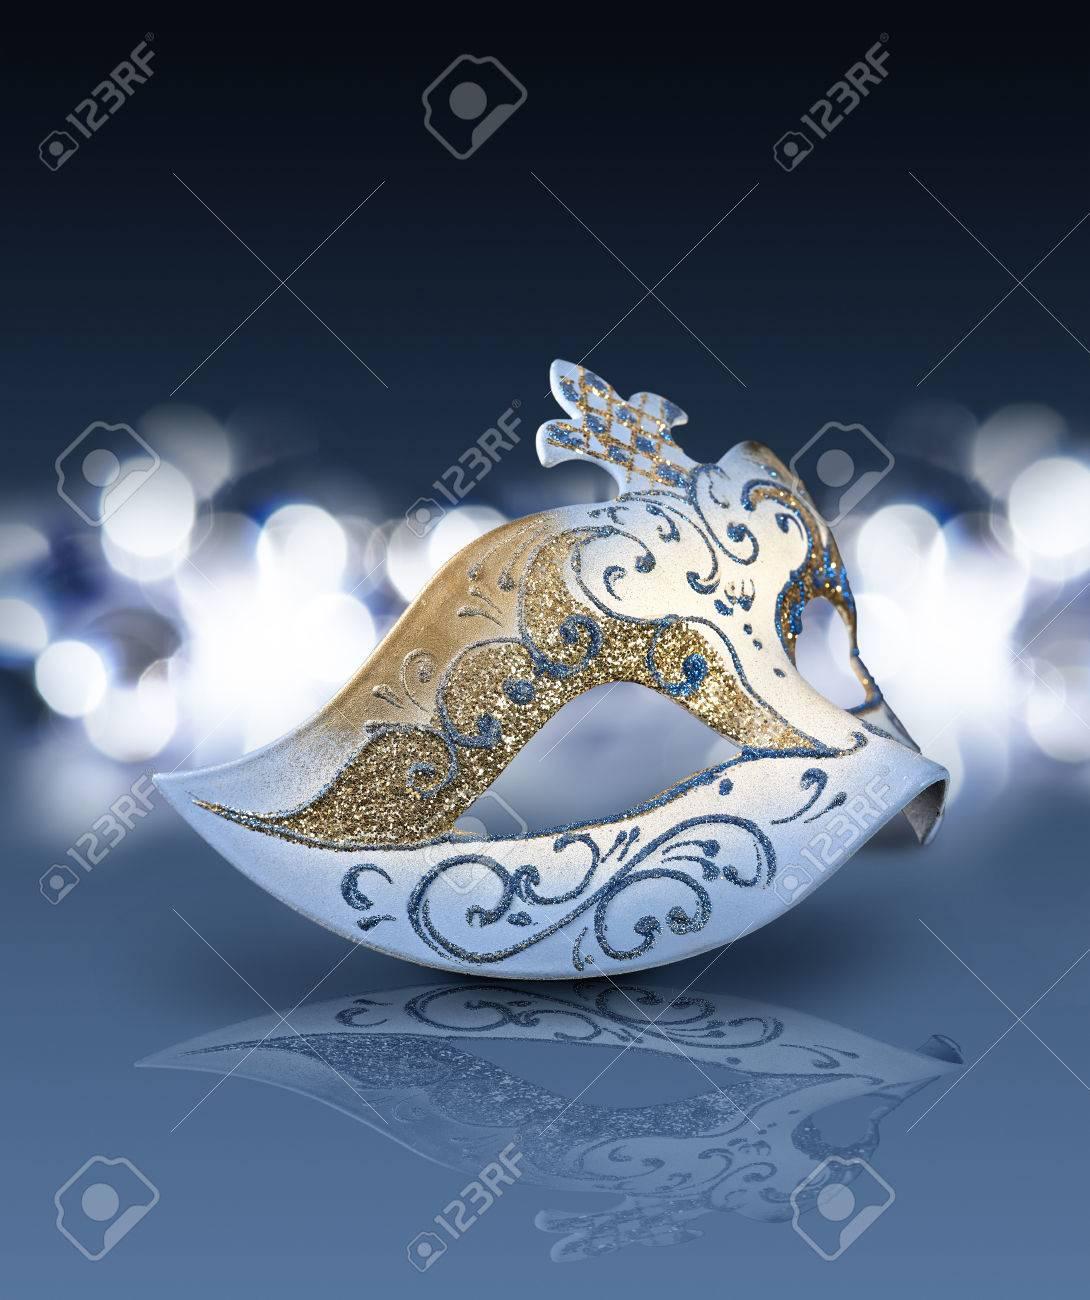 Female carnival mask with glittering background in blue mood Standard-Bild - 24697651